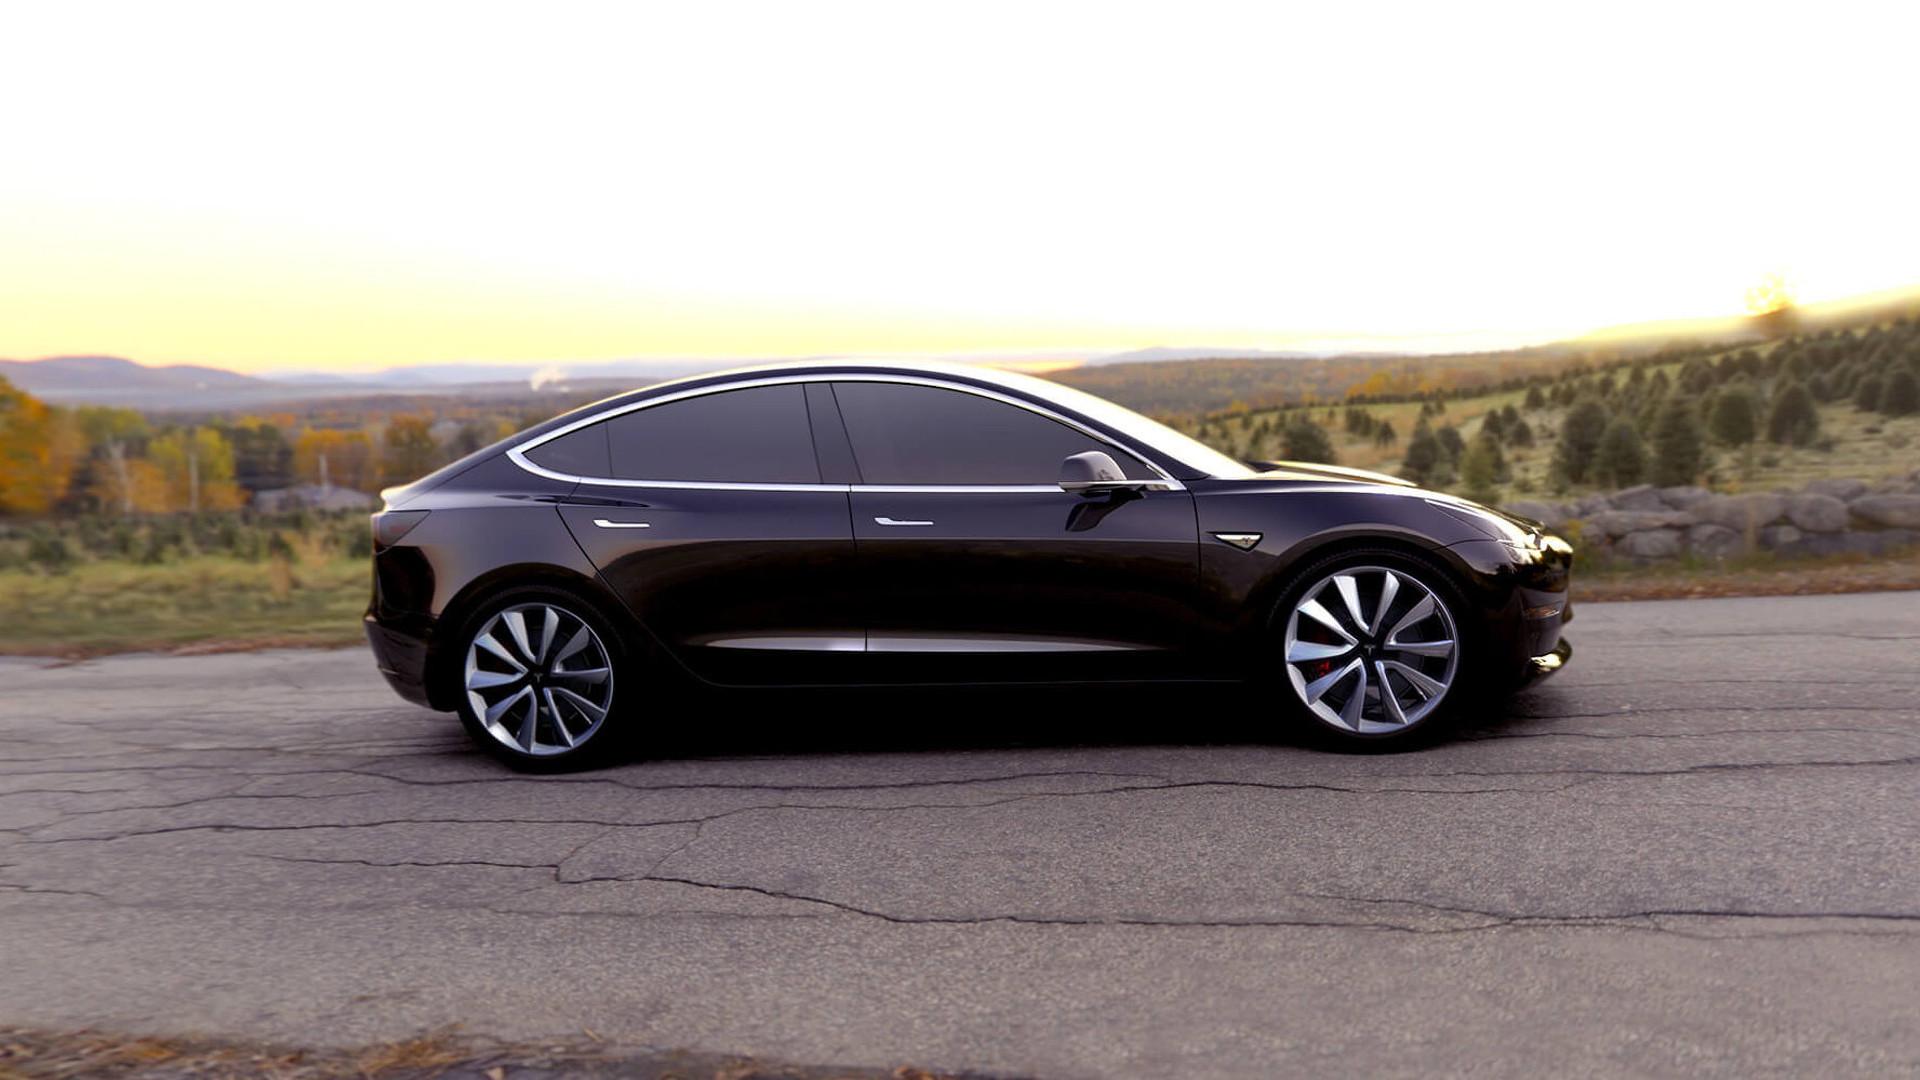 Tesla Model 3 clocks 276k pre-orders, LG tipped to make the touchscreen